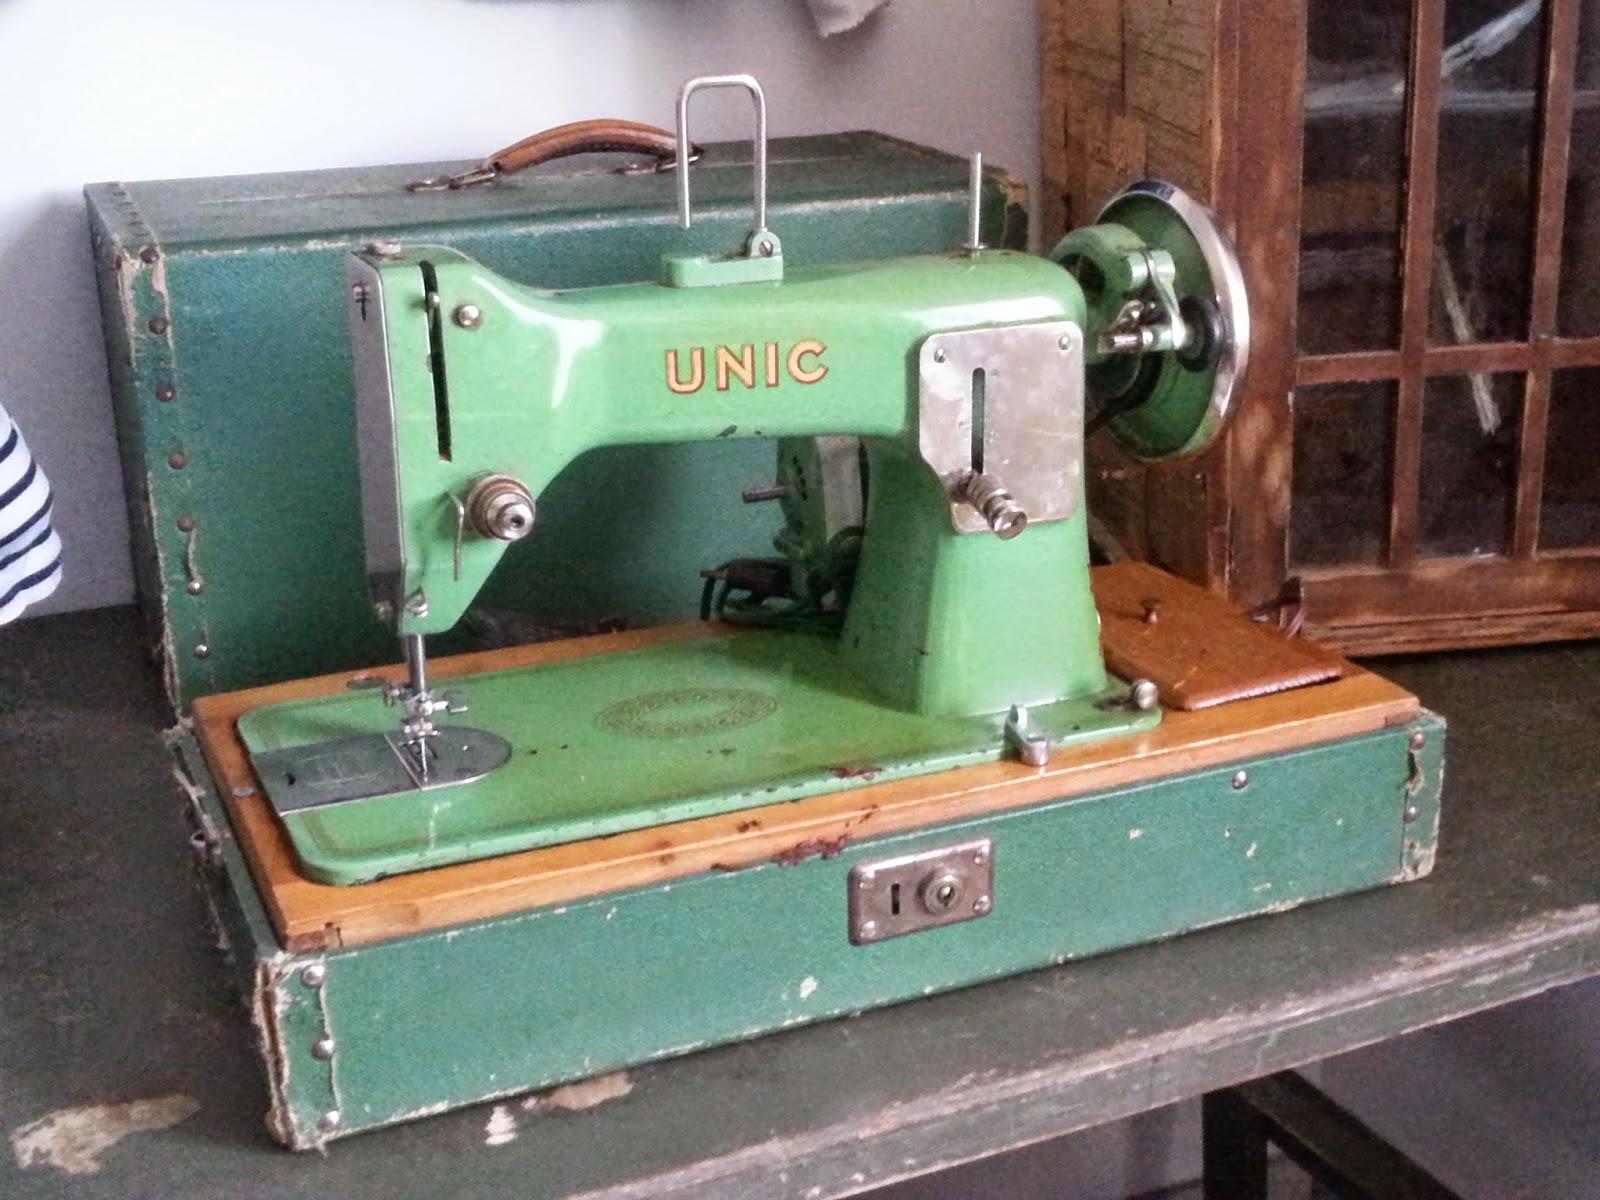 luckyfactory40 machine a coudre unic a echanger